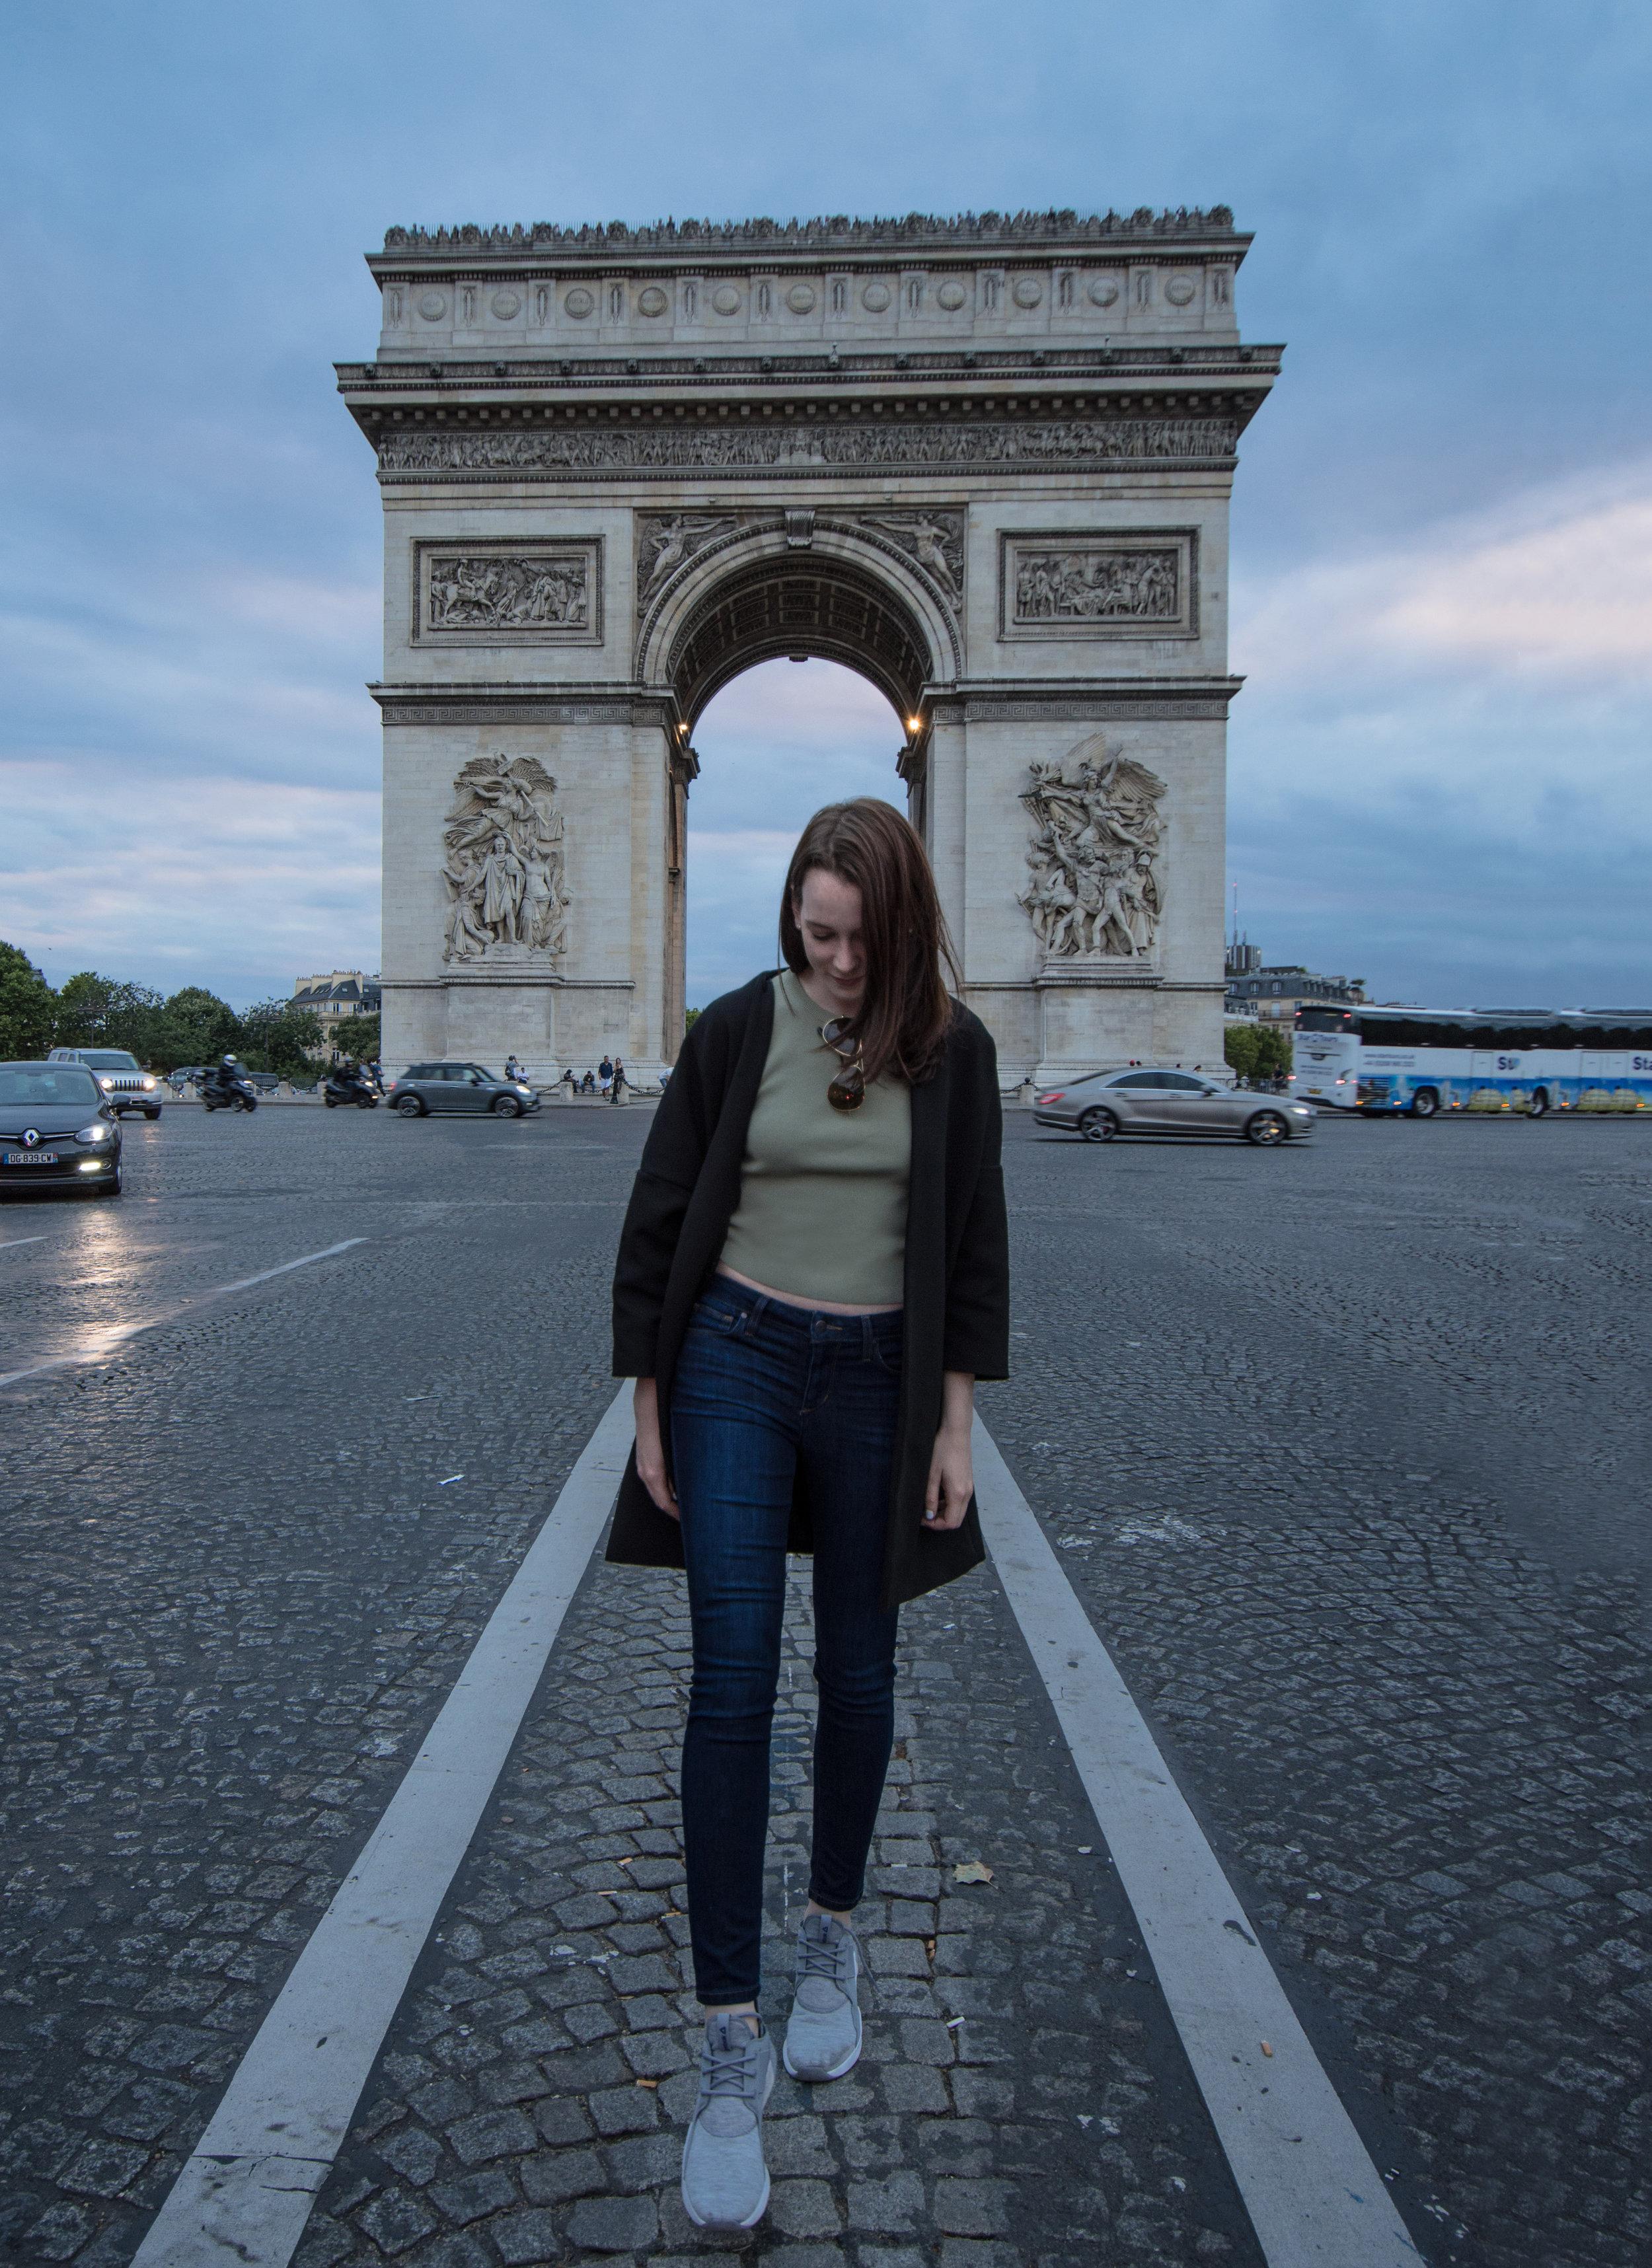 Arc De Triomphe final.jpg